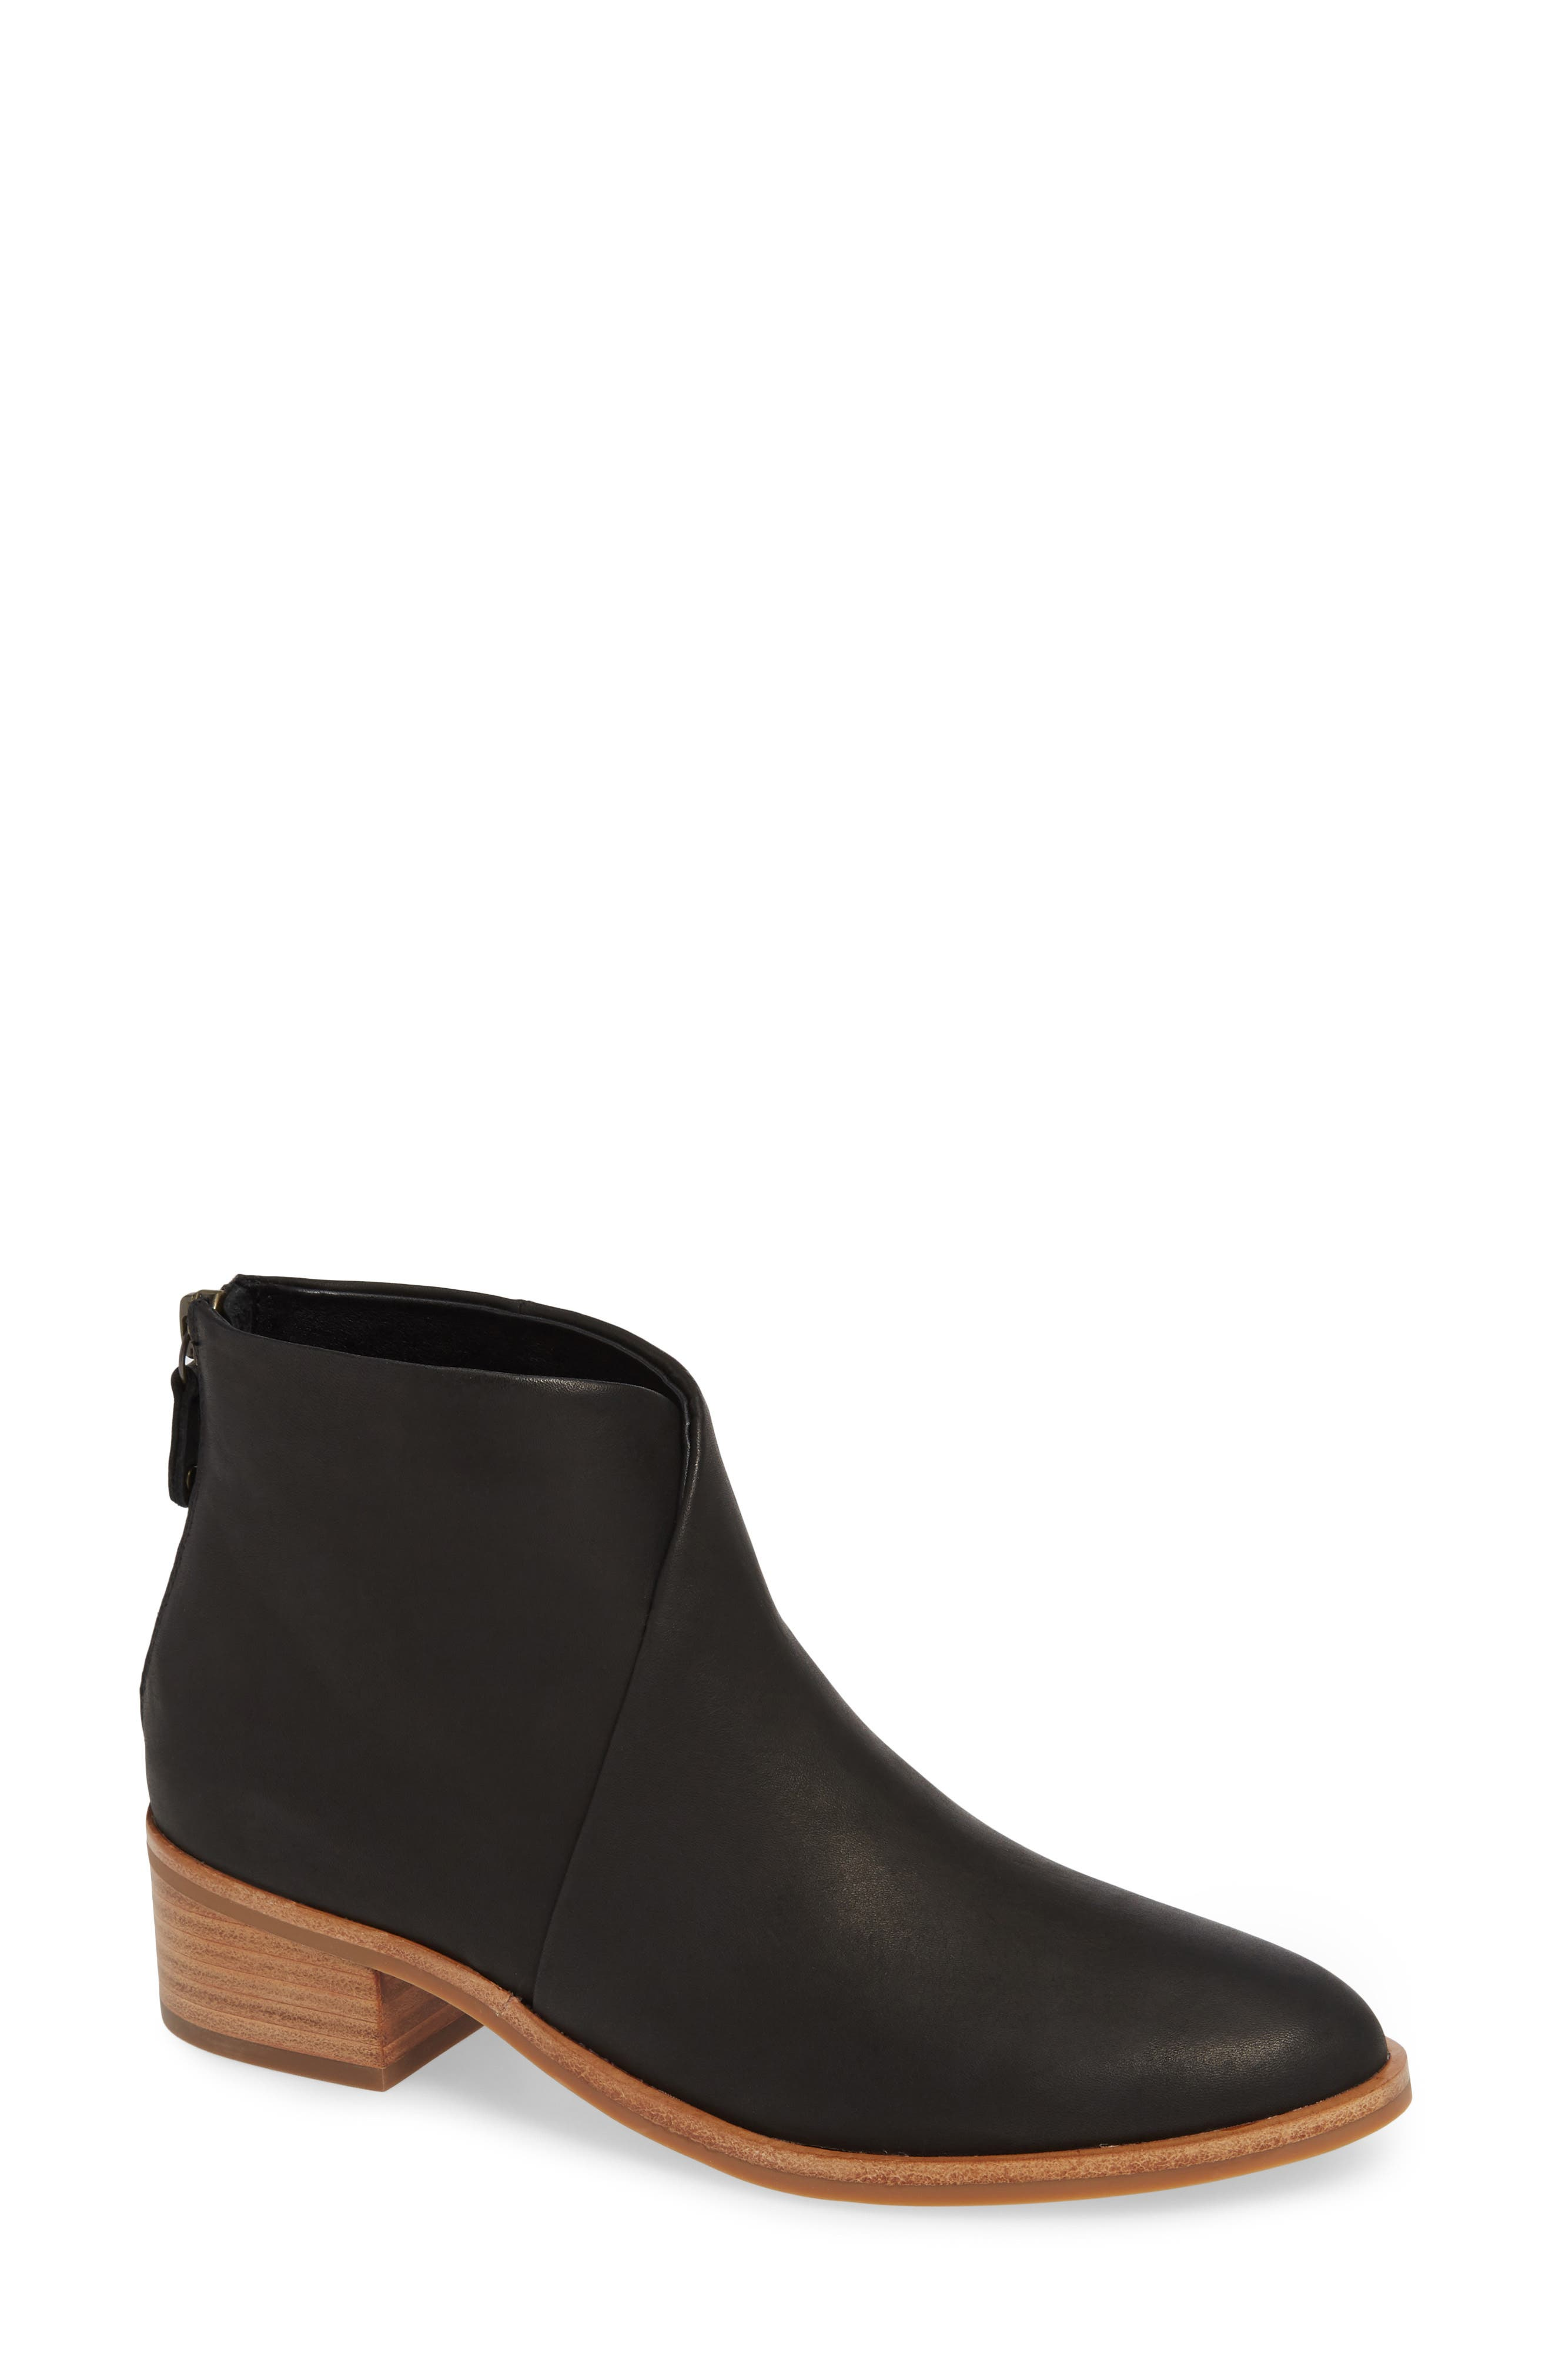 SOLUDOS Venetian Leather Booties in Black